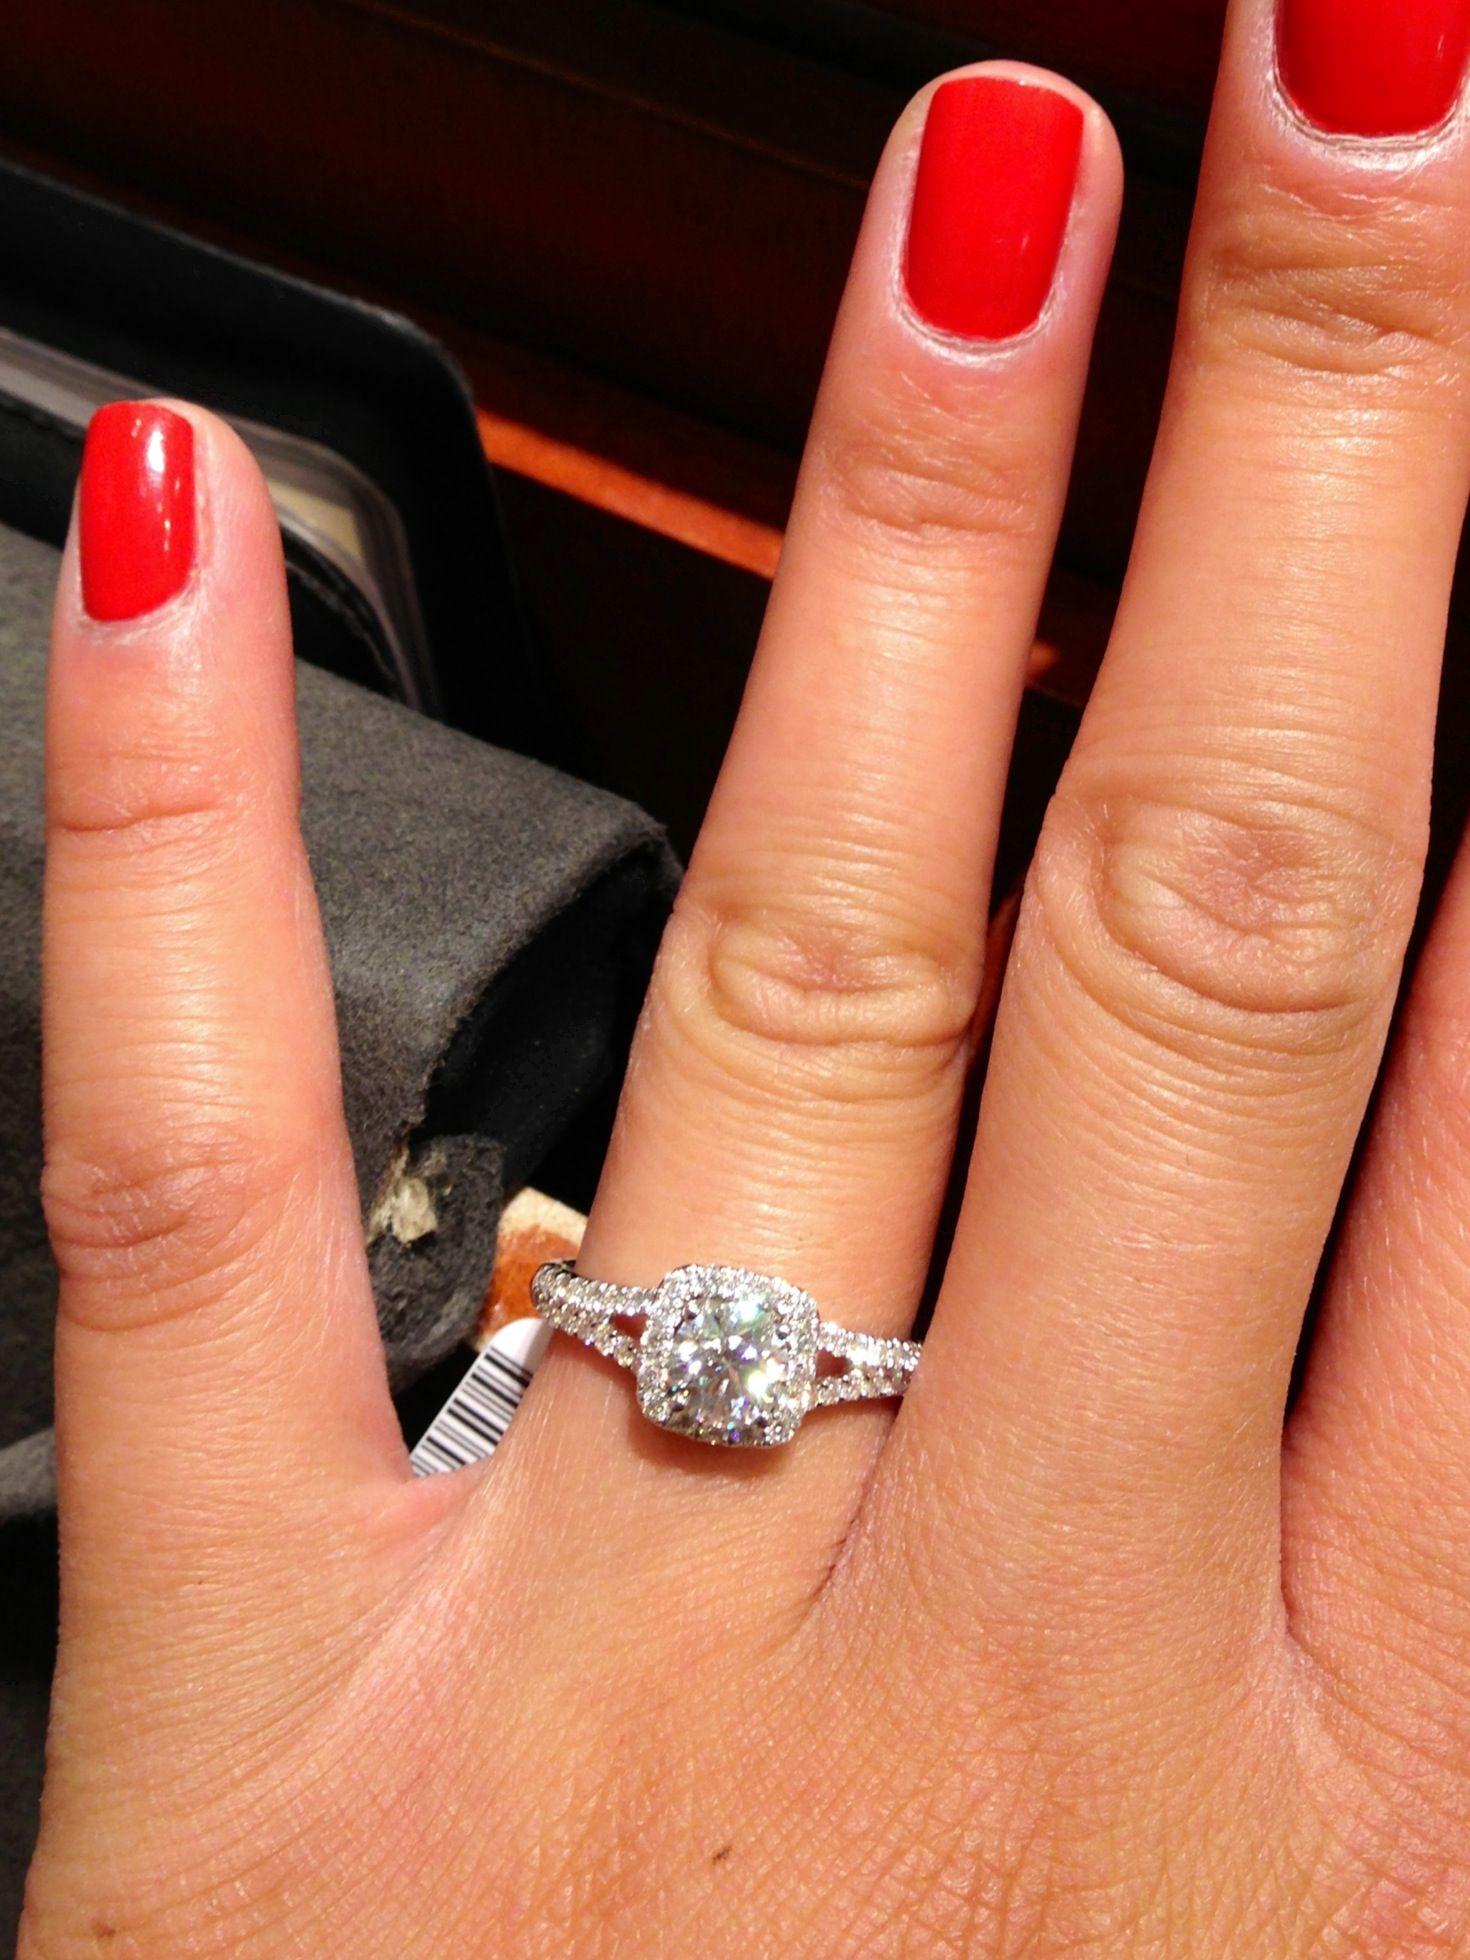 zales diamond wedding rings 1 carat Celebration Fire split shank halo at Zales